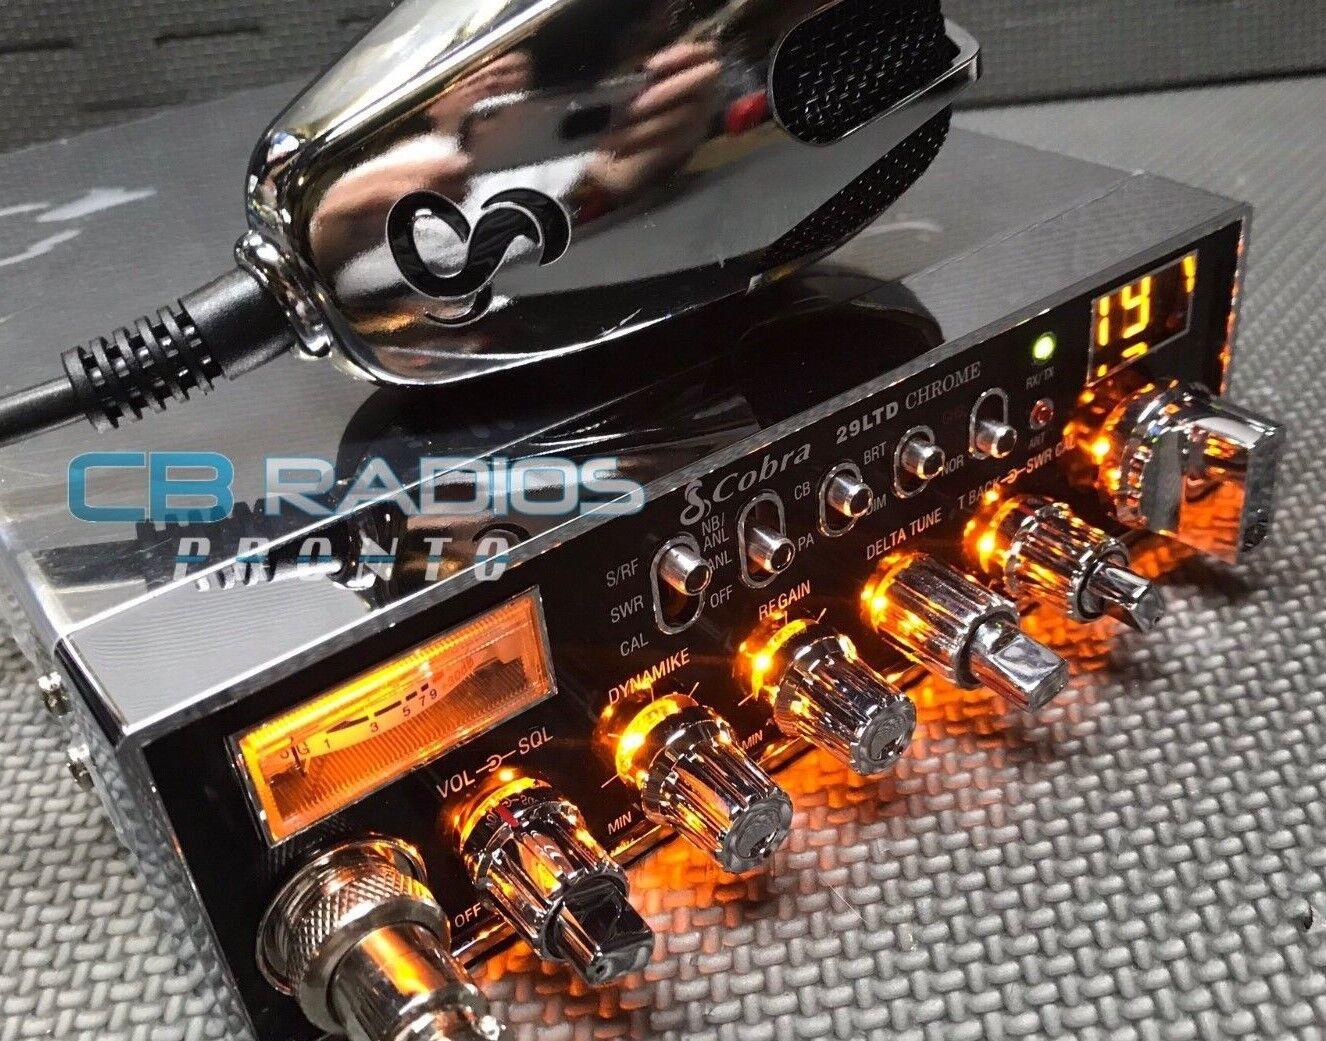 Cobra 29 LTD Chrome - AMBER LIGHT EDITION+PERFORMANCE TUNE+RECEIVE ENHANCE+ECHO. Buy it now for 379.00